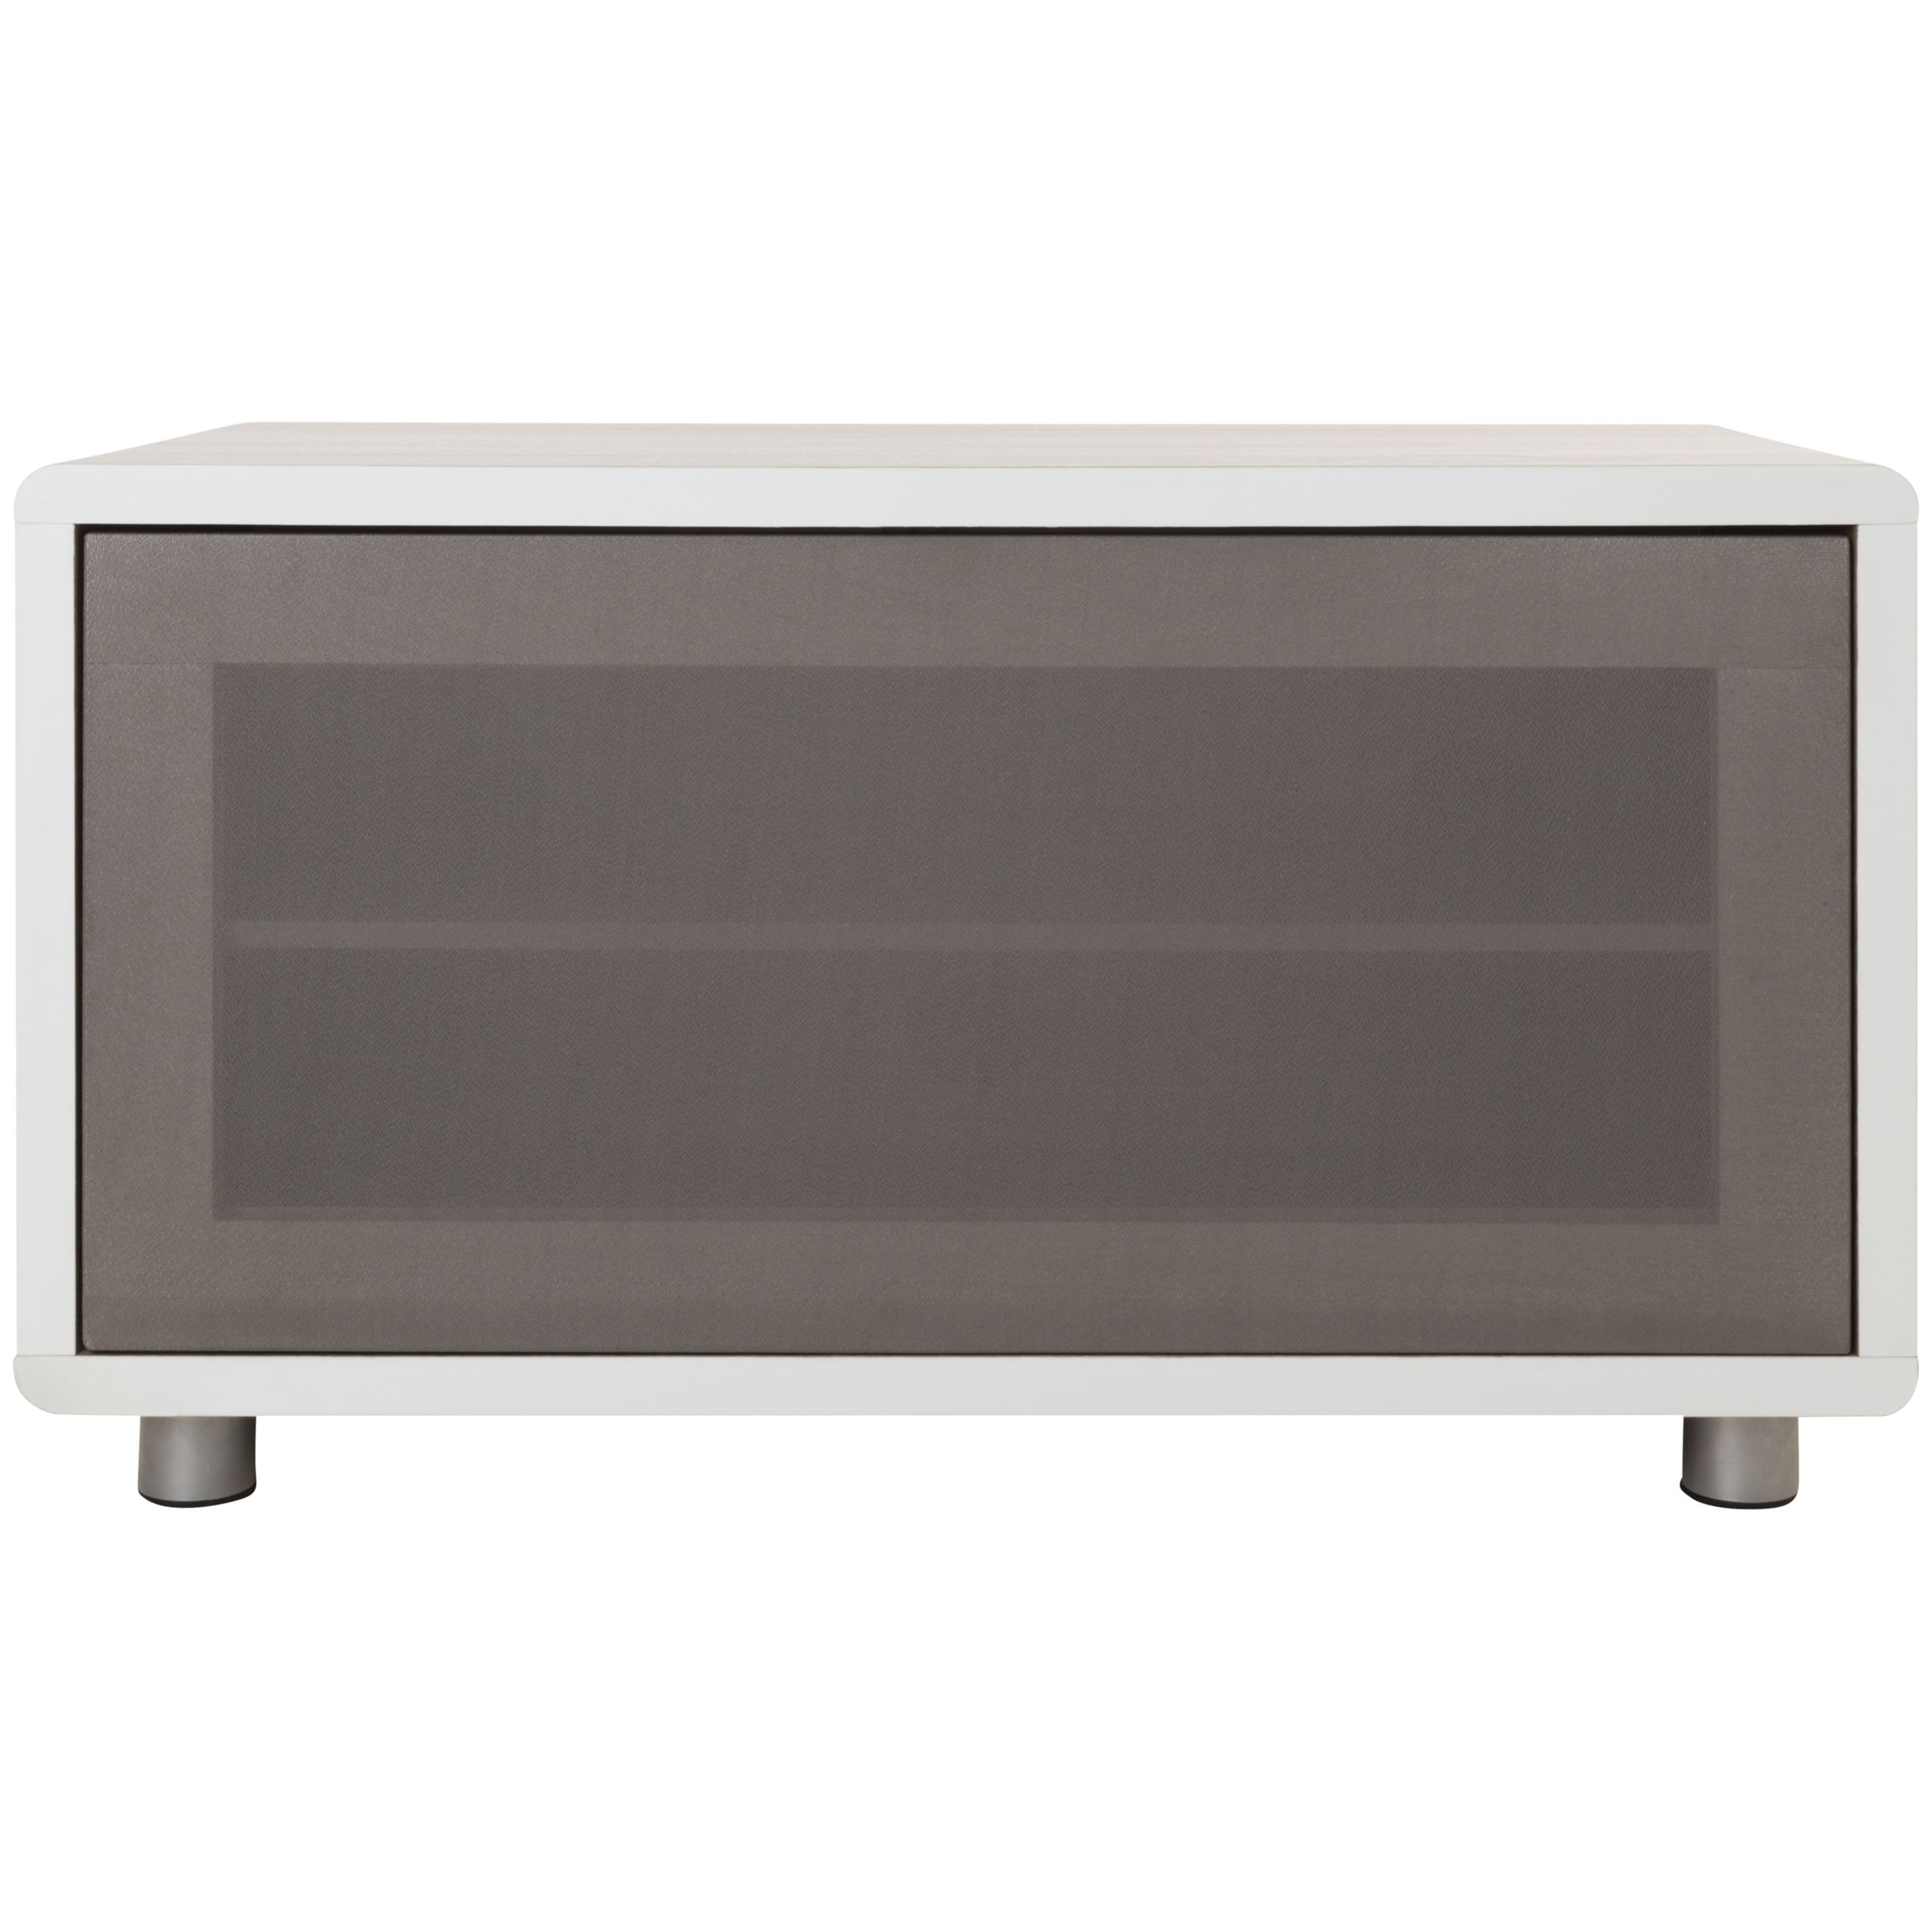 AVF AVF Connect Modular TV Stand for TVs up to 40, Oak/White